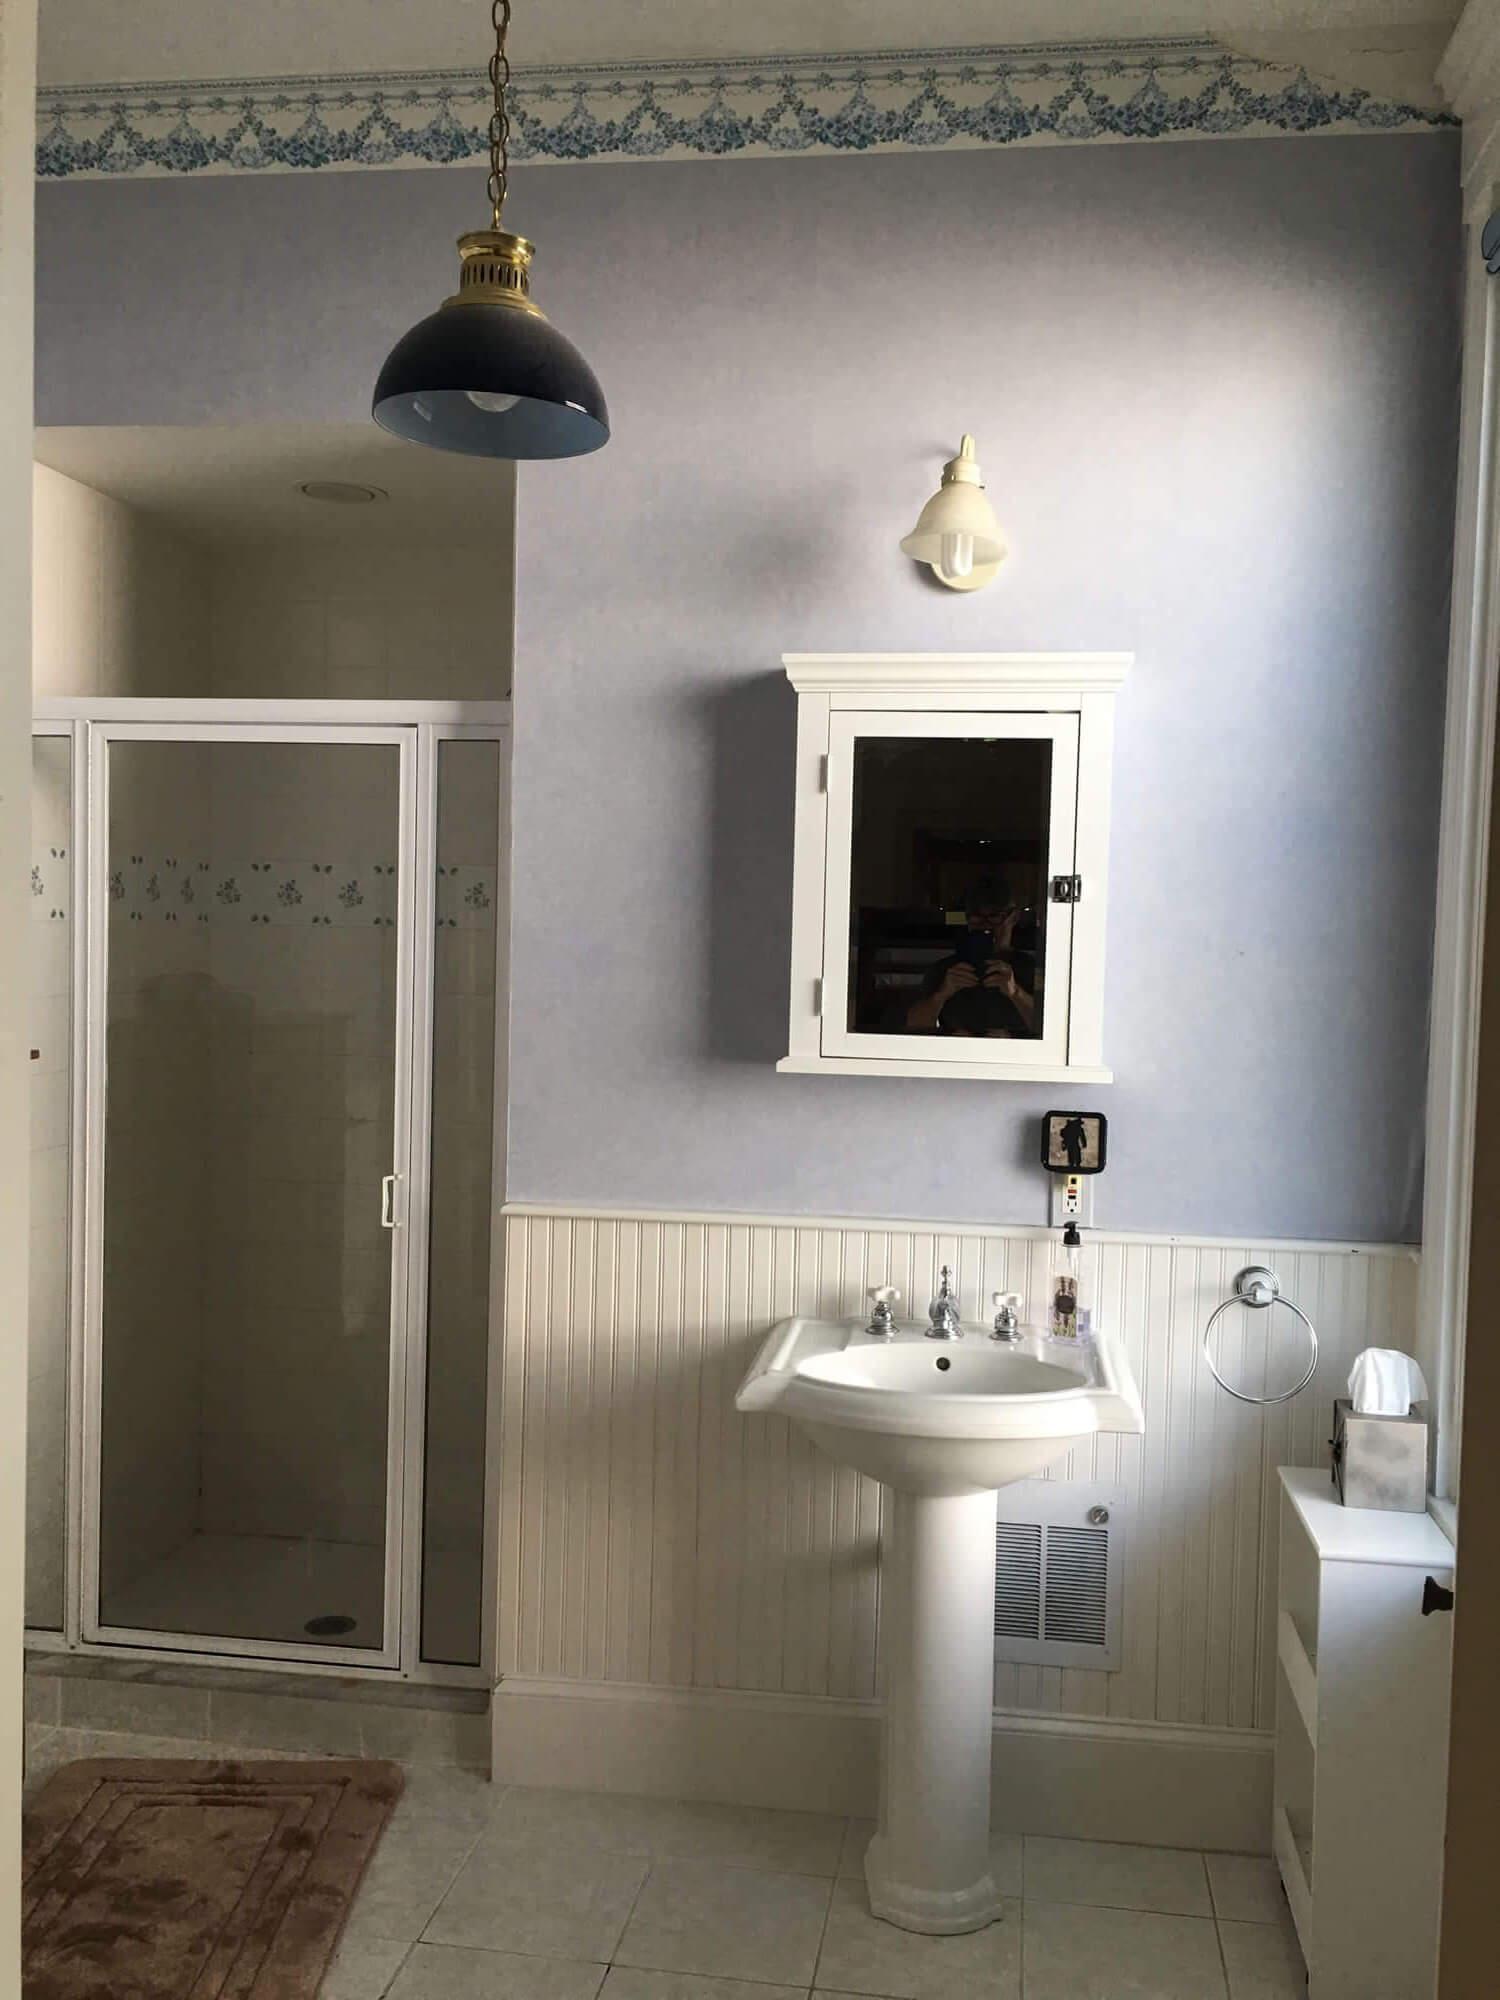 maine-yoga-retreats-bathrooms-20180713-0893